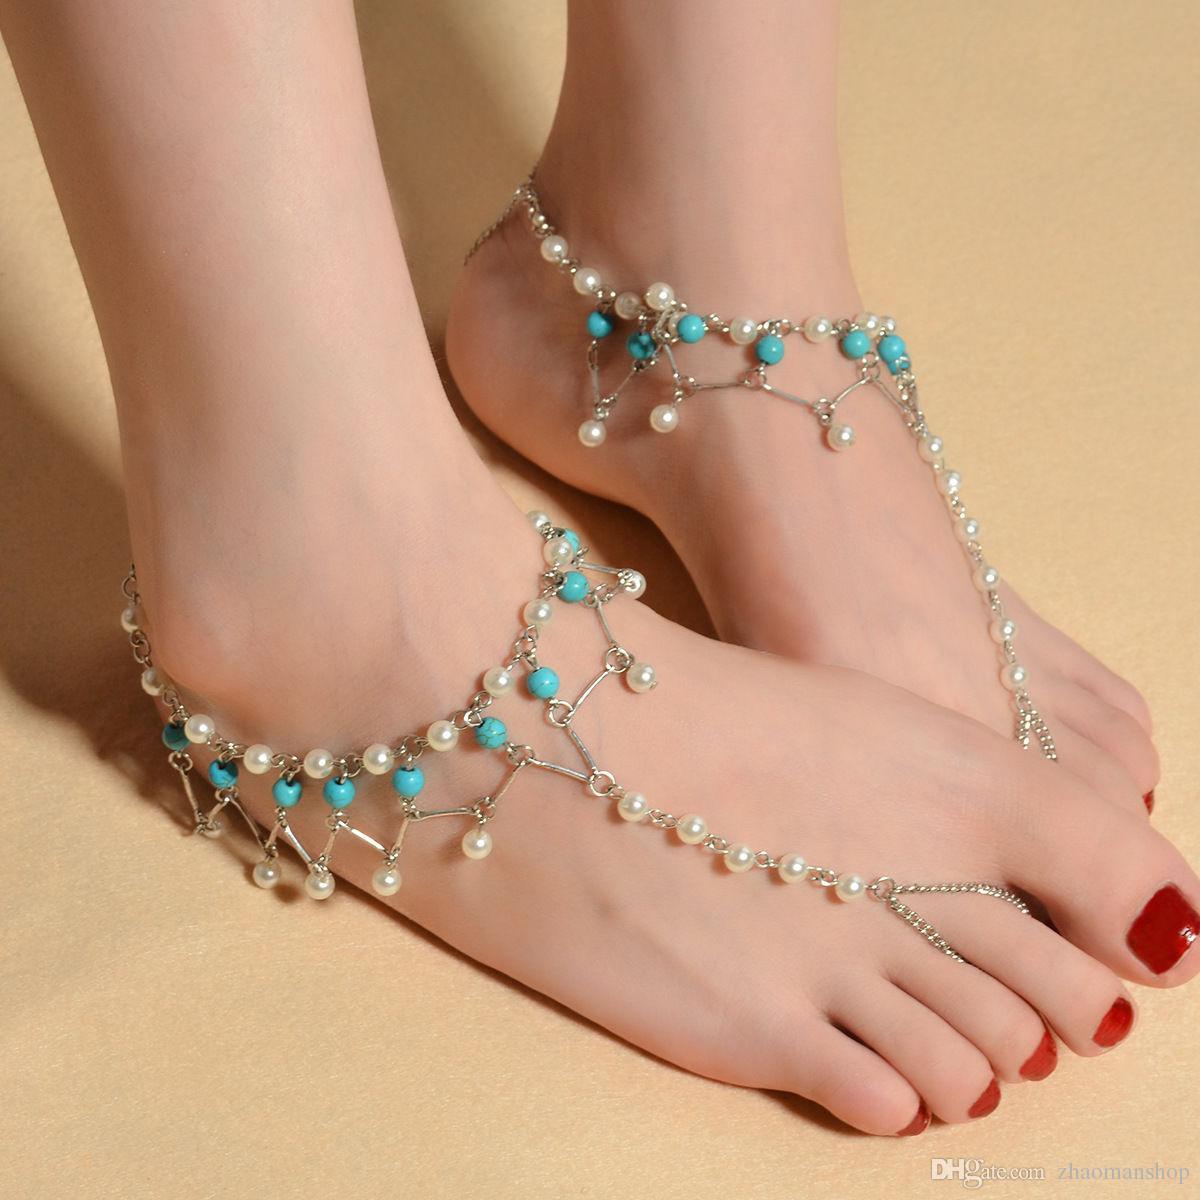 Beach Foot Jewelry Ankle Bracelet Pearl Tassel Barefoot Sandal Anklet Chain